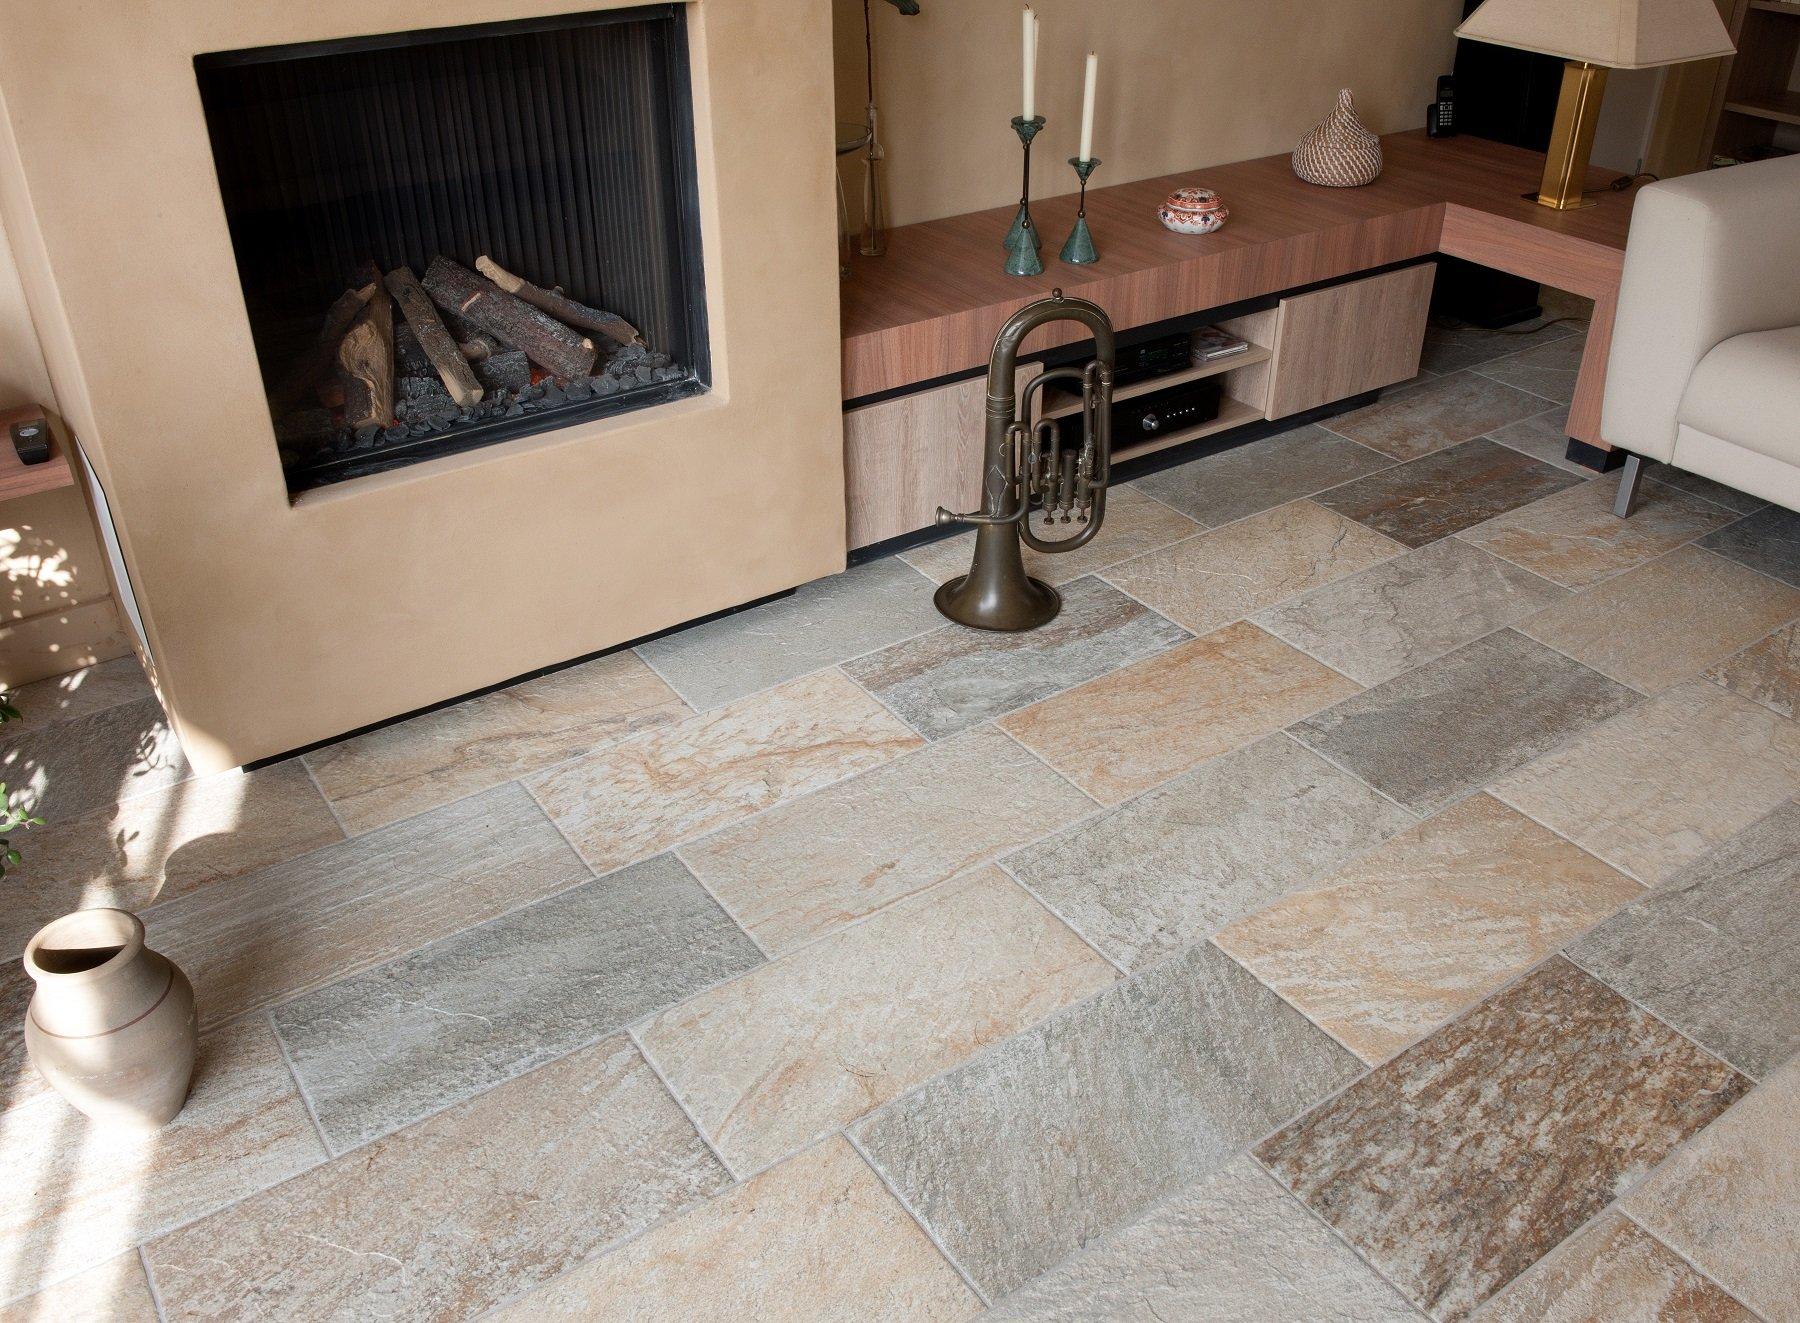 Lichte Plavuizen Vloer : Vloertegels woonkamer kroon vloeren in steen